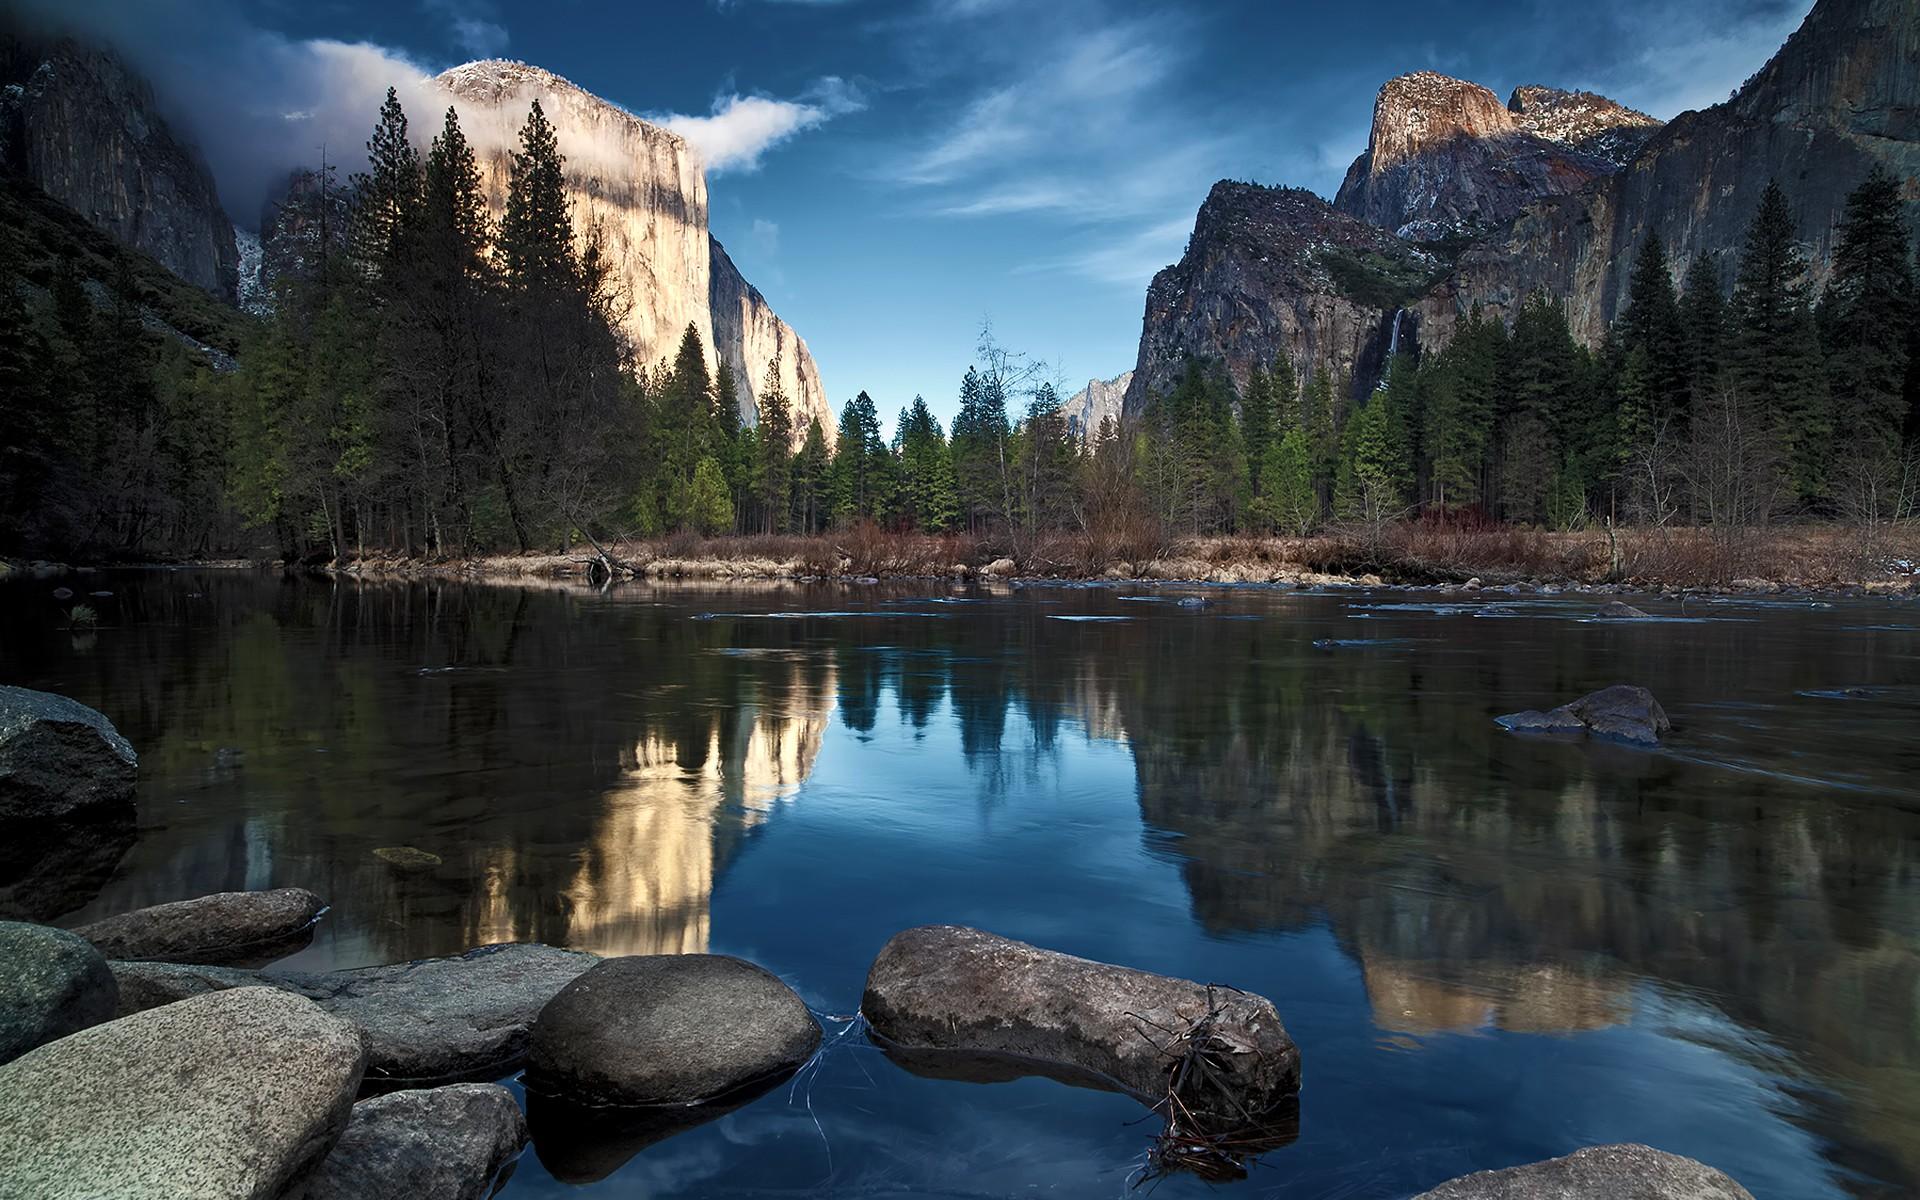 обои озеро, камни, горы, скалы картинки фото